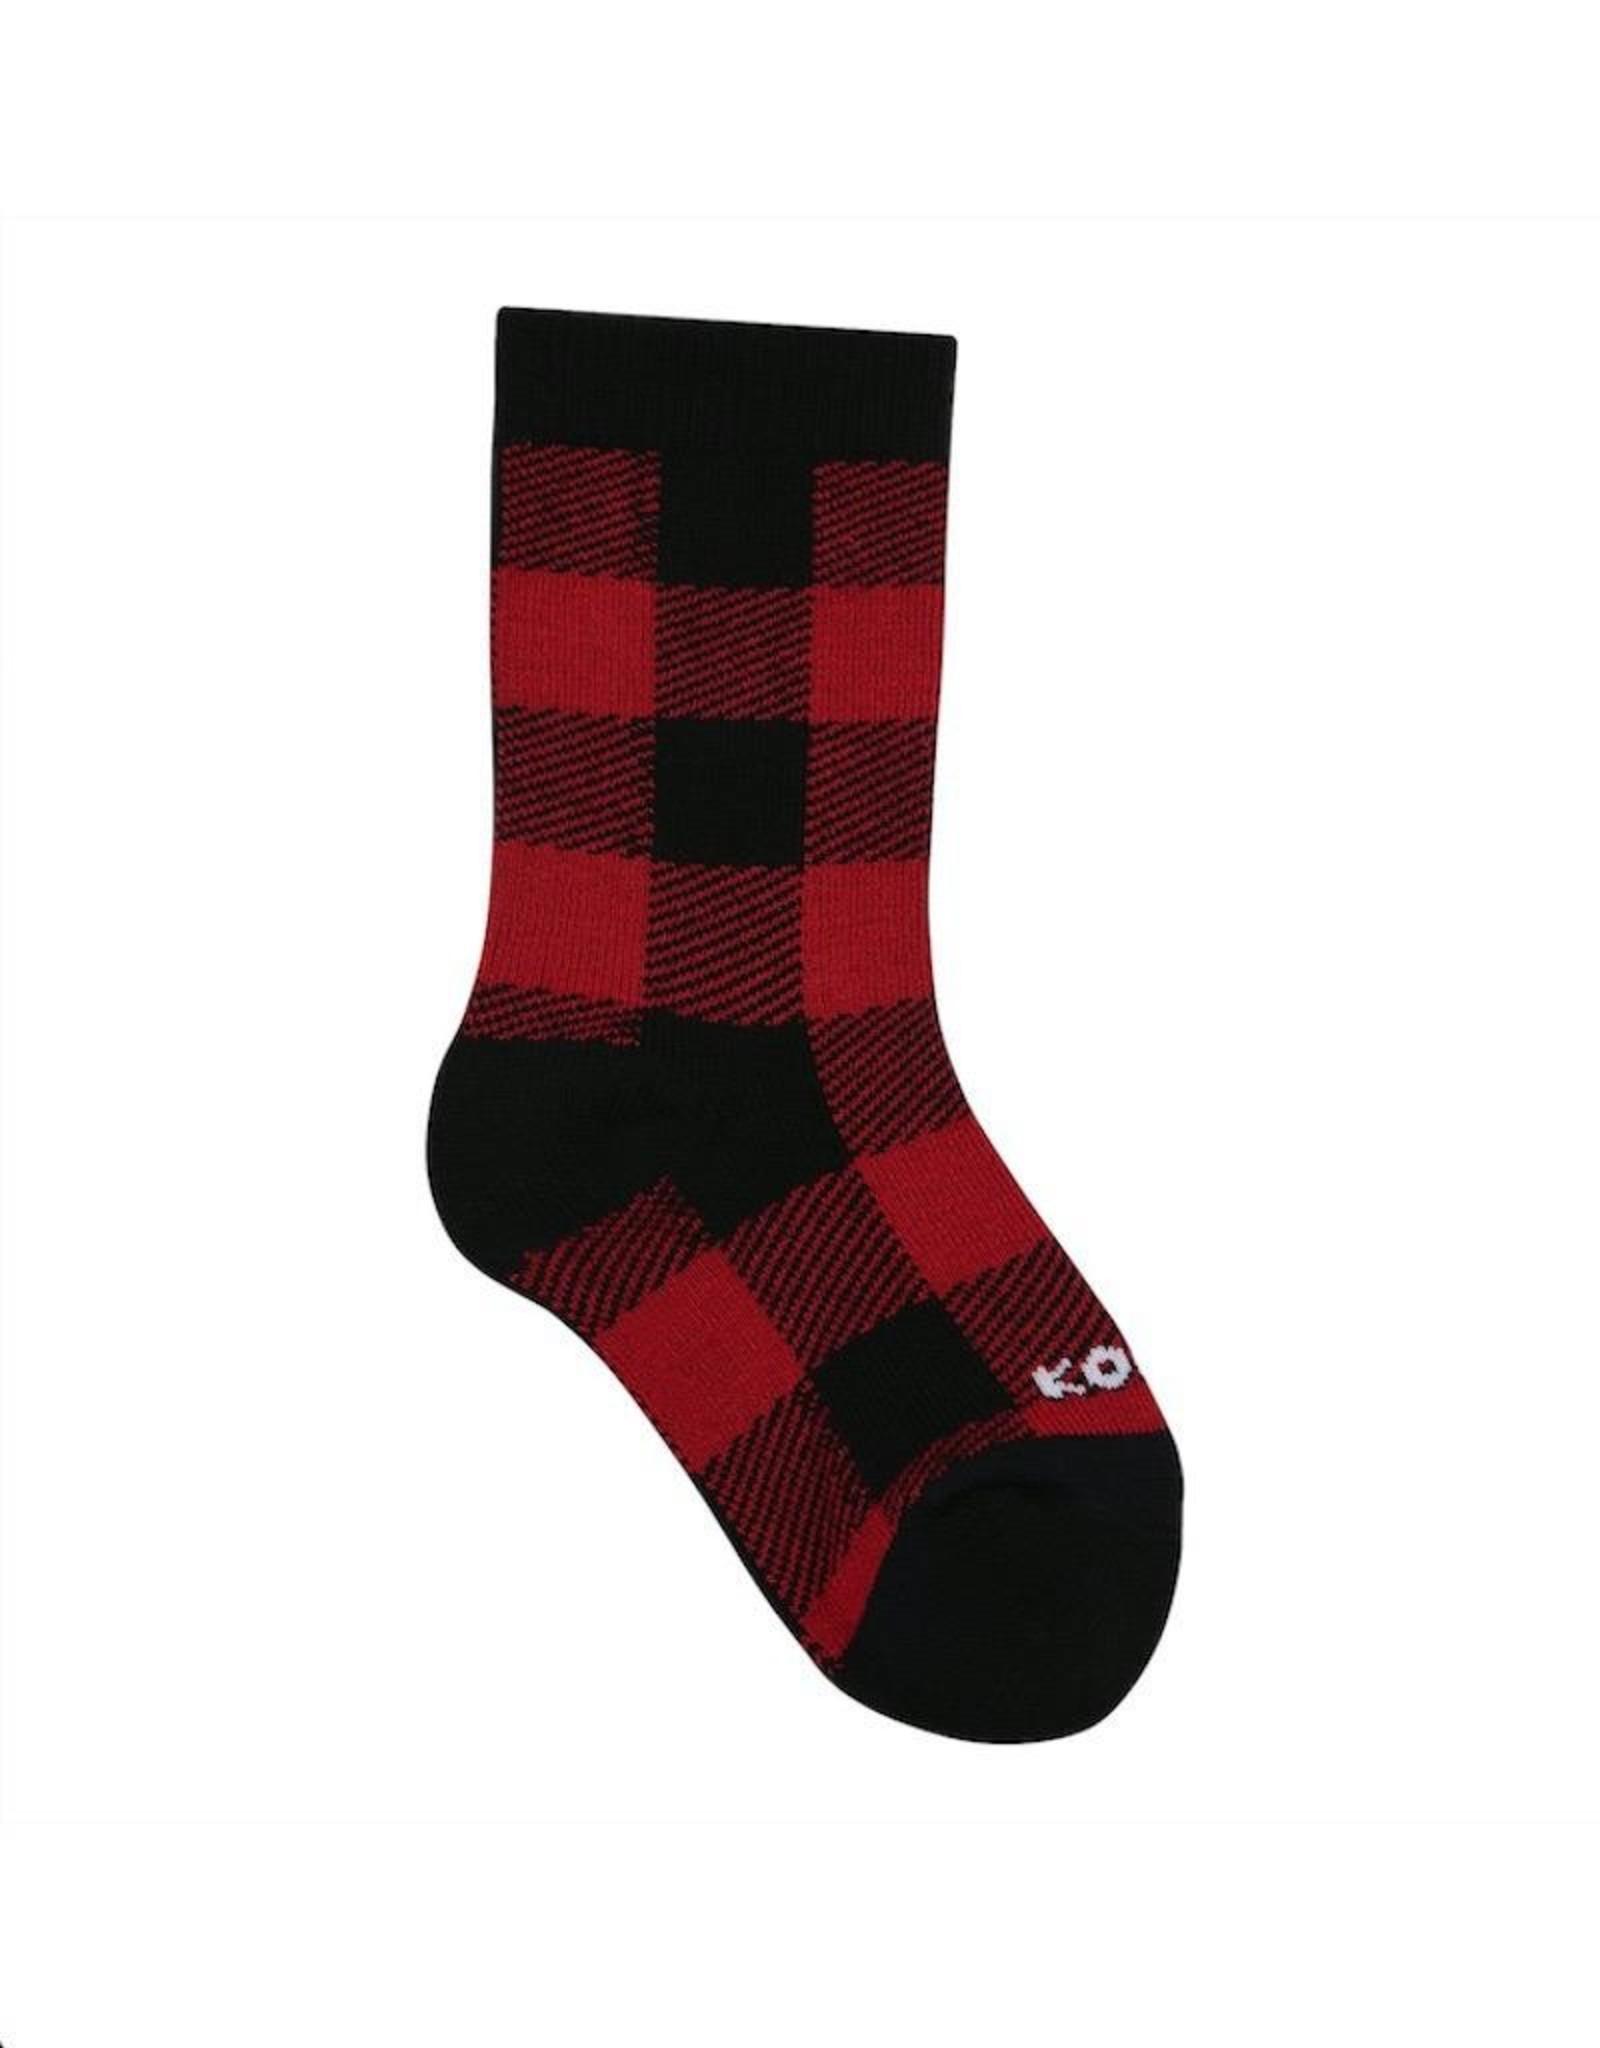 Kombi The Lodge Children's Socks Red Buffalo Plaid